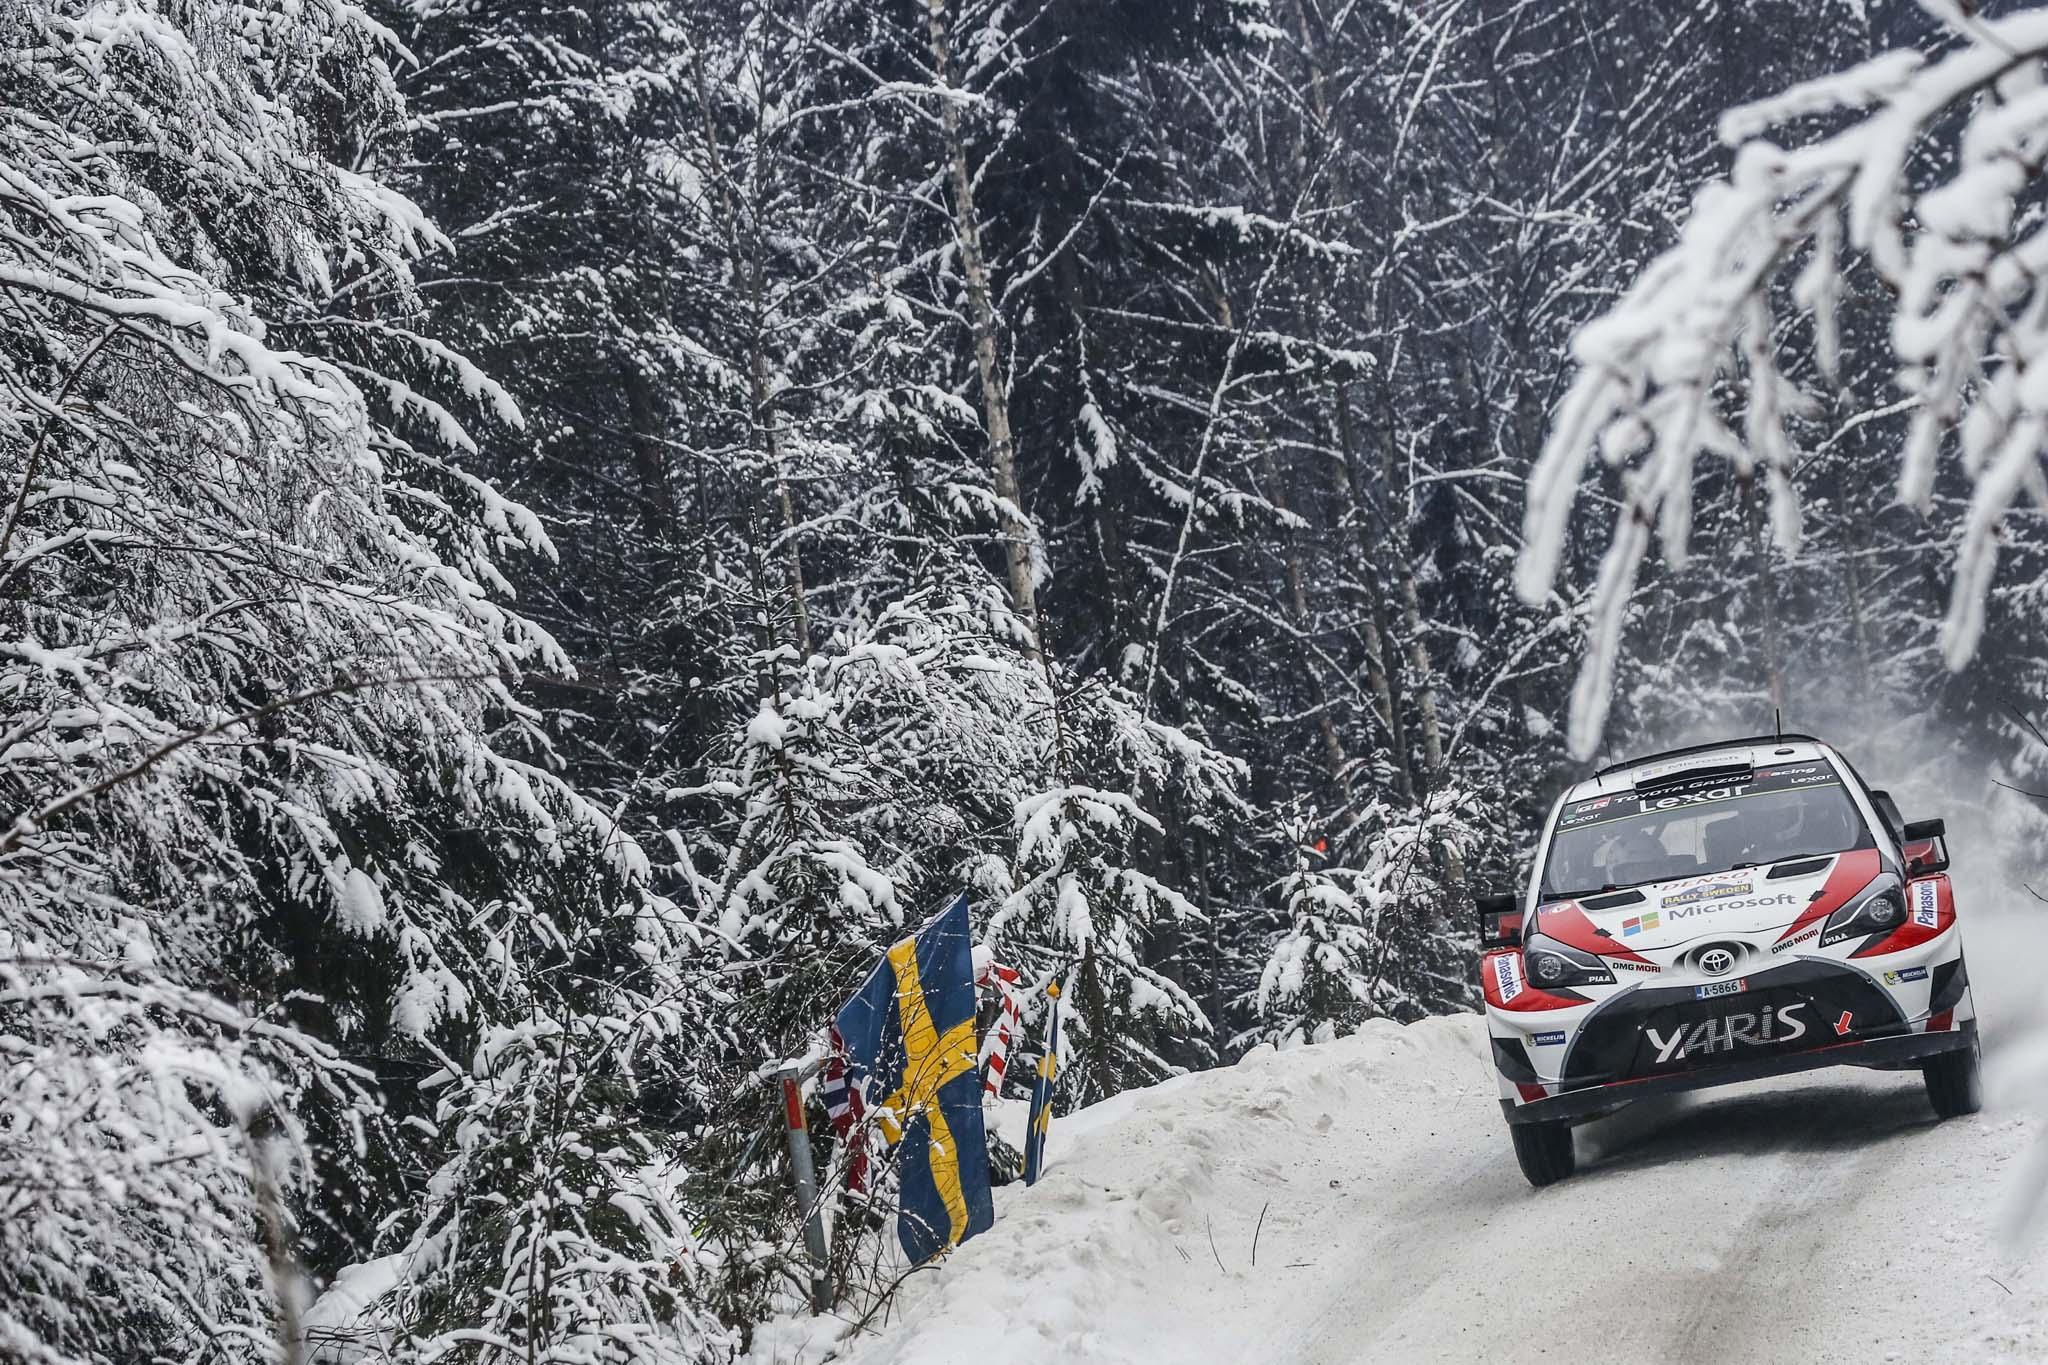 FIA WORLD RALLY CHAMPIONSHIP 2017 – WRC SWEDEN